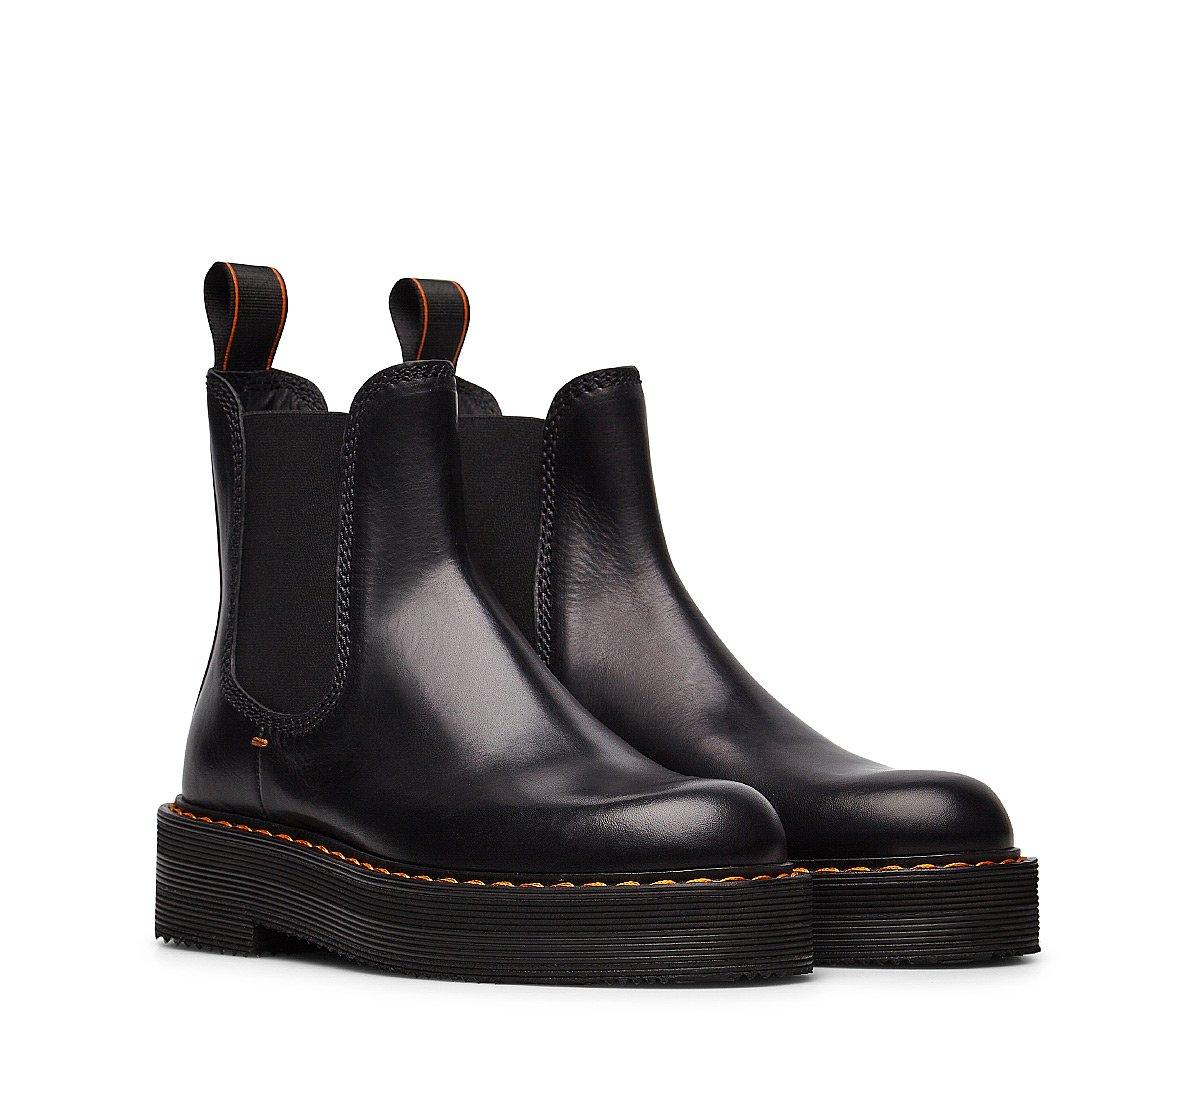 Barracuda fine calfskin Beatle boots